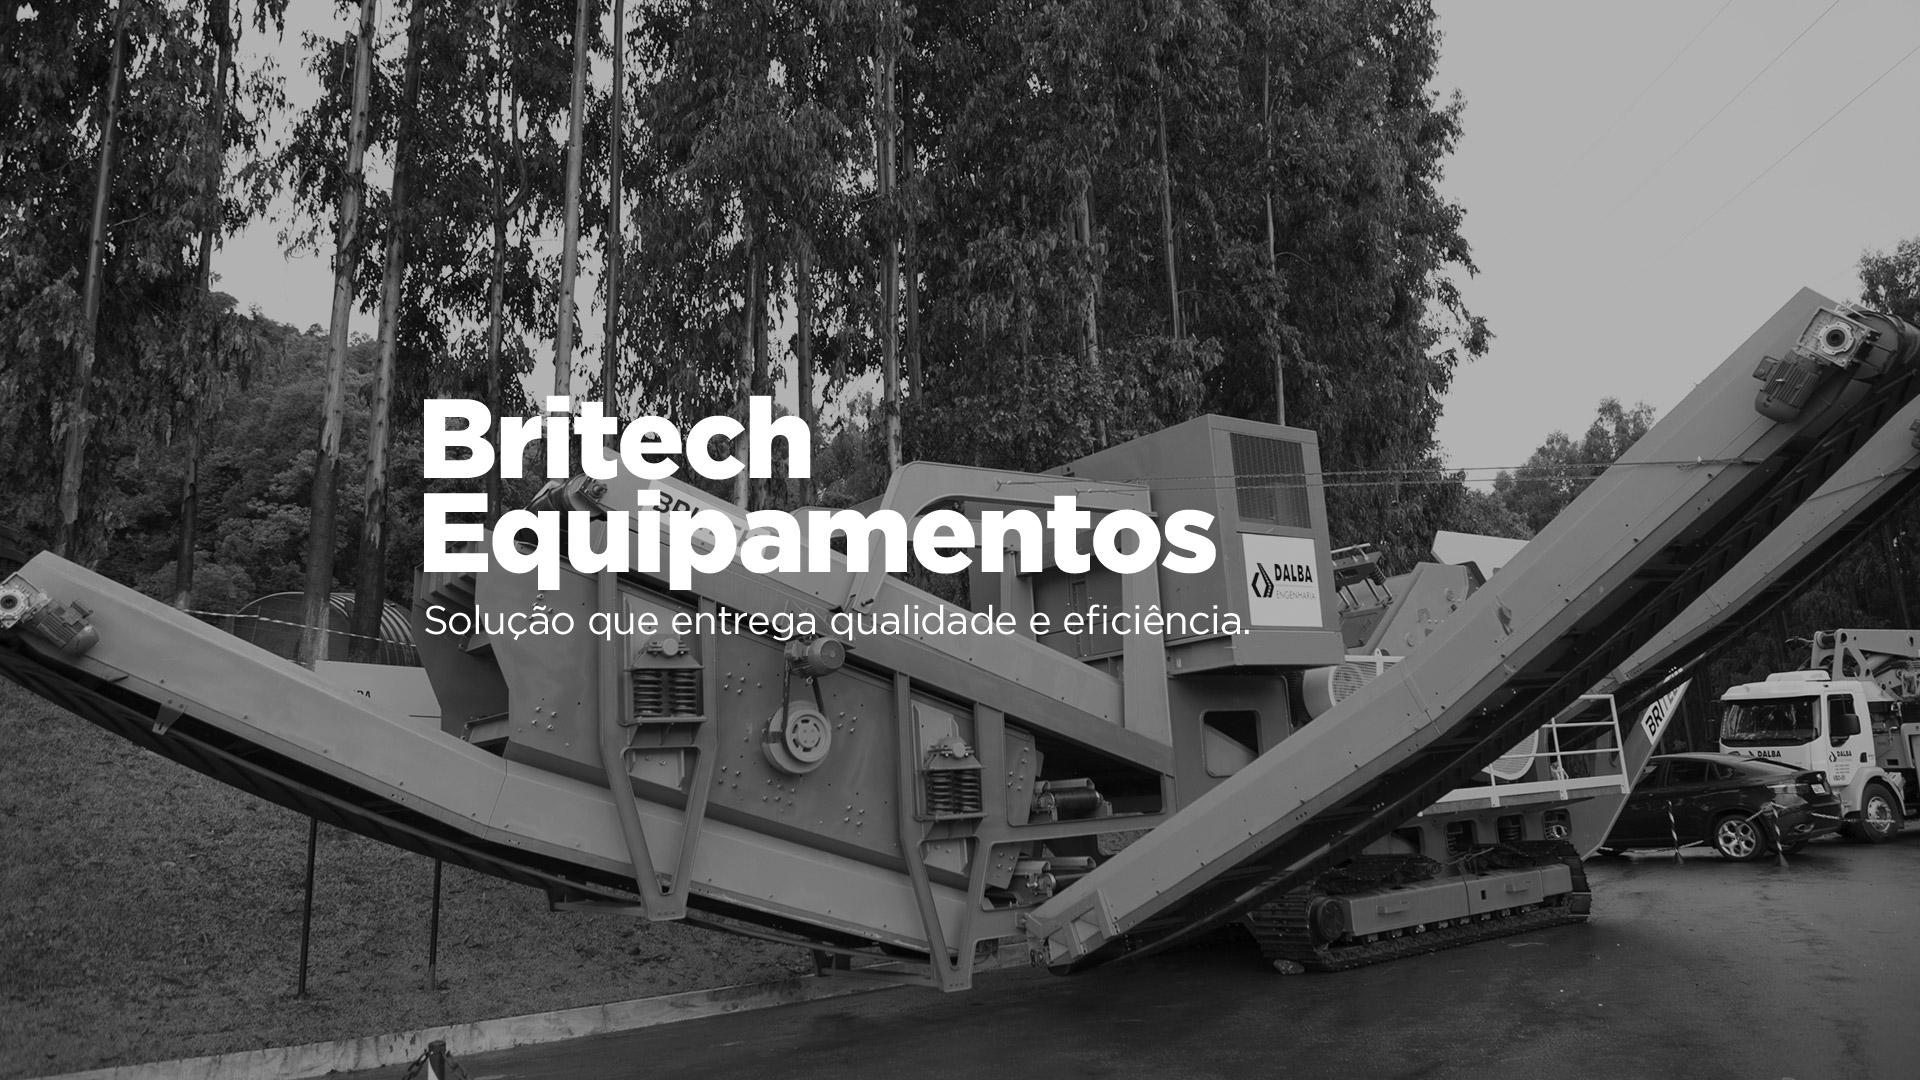 Britech Equipamentos